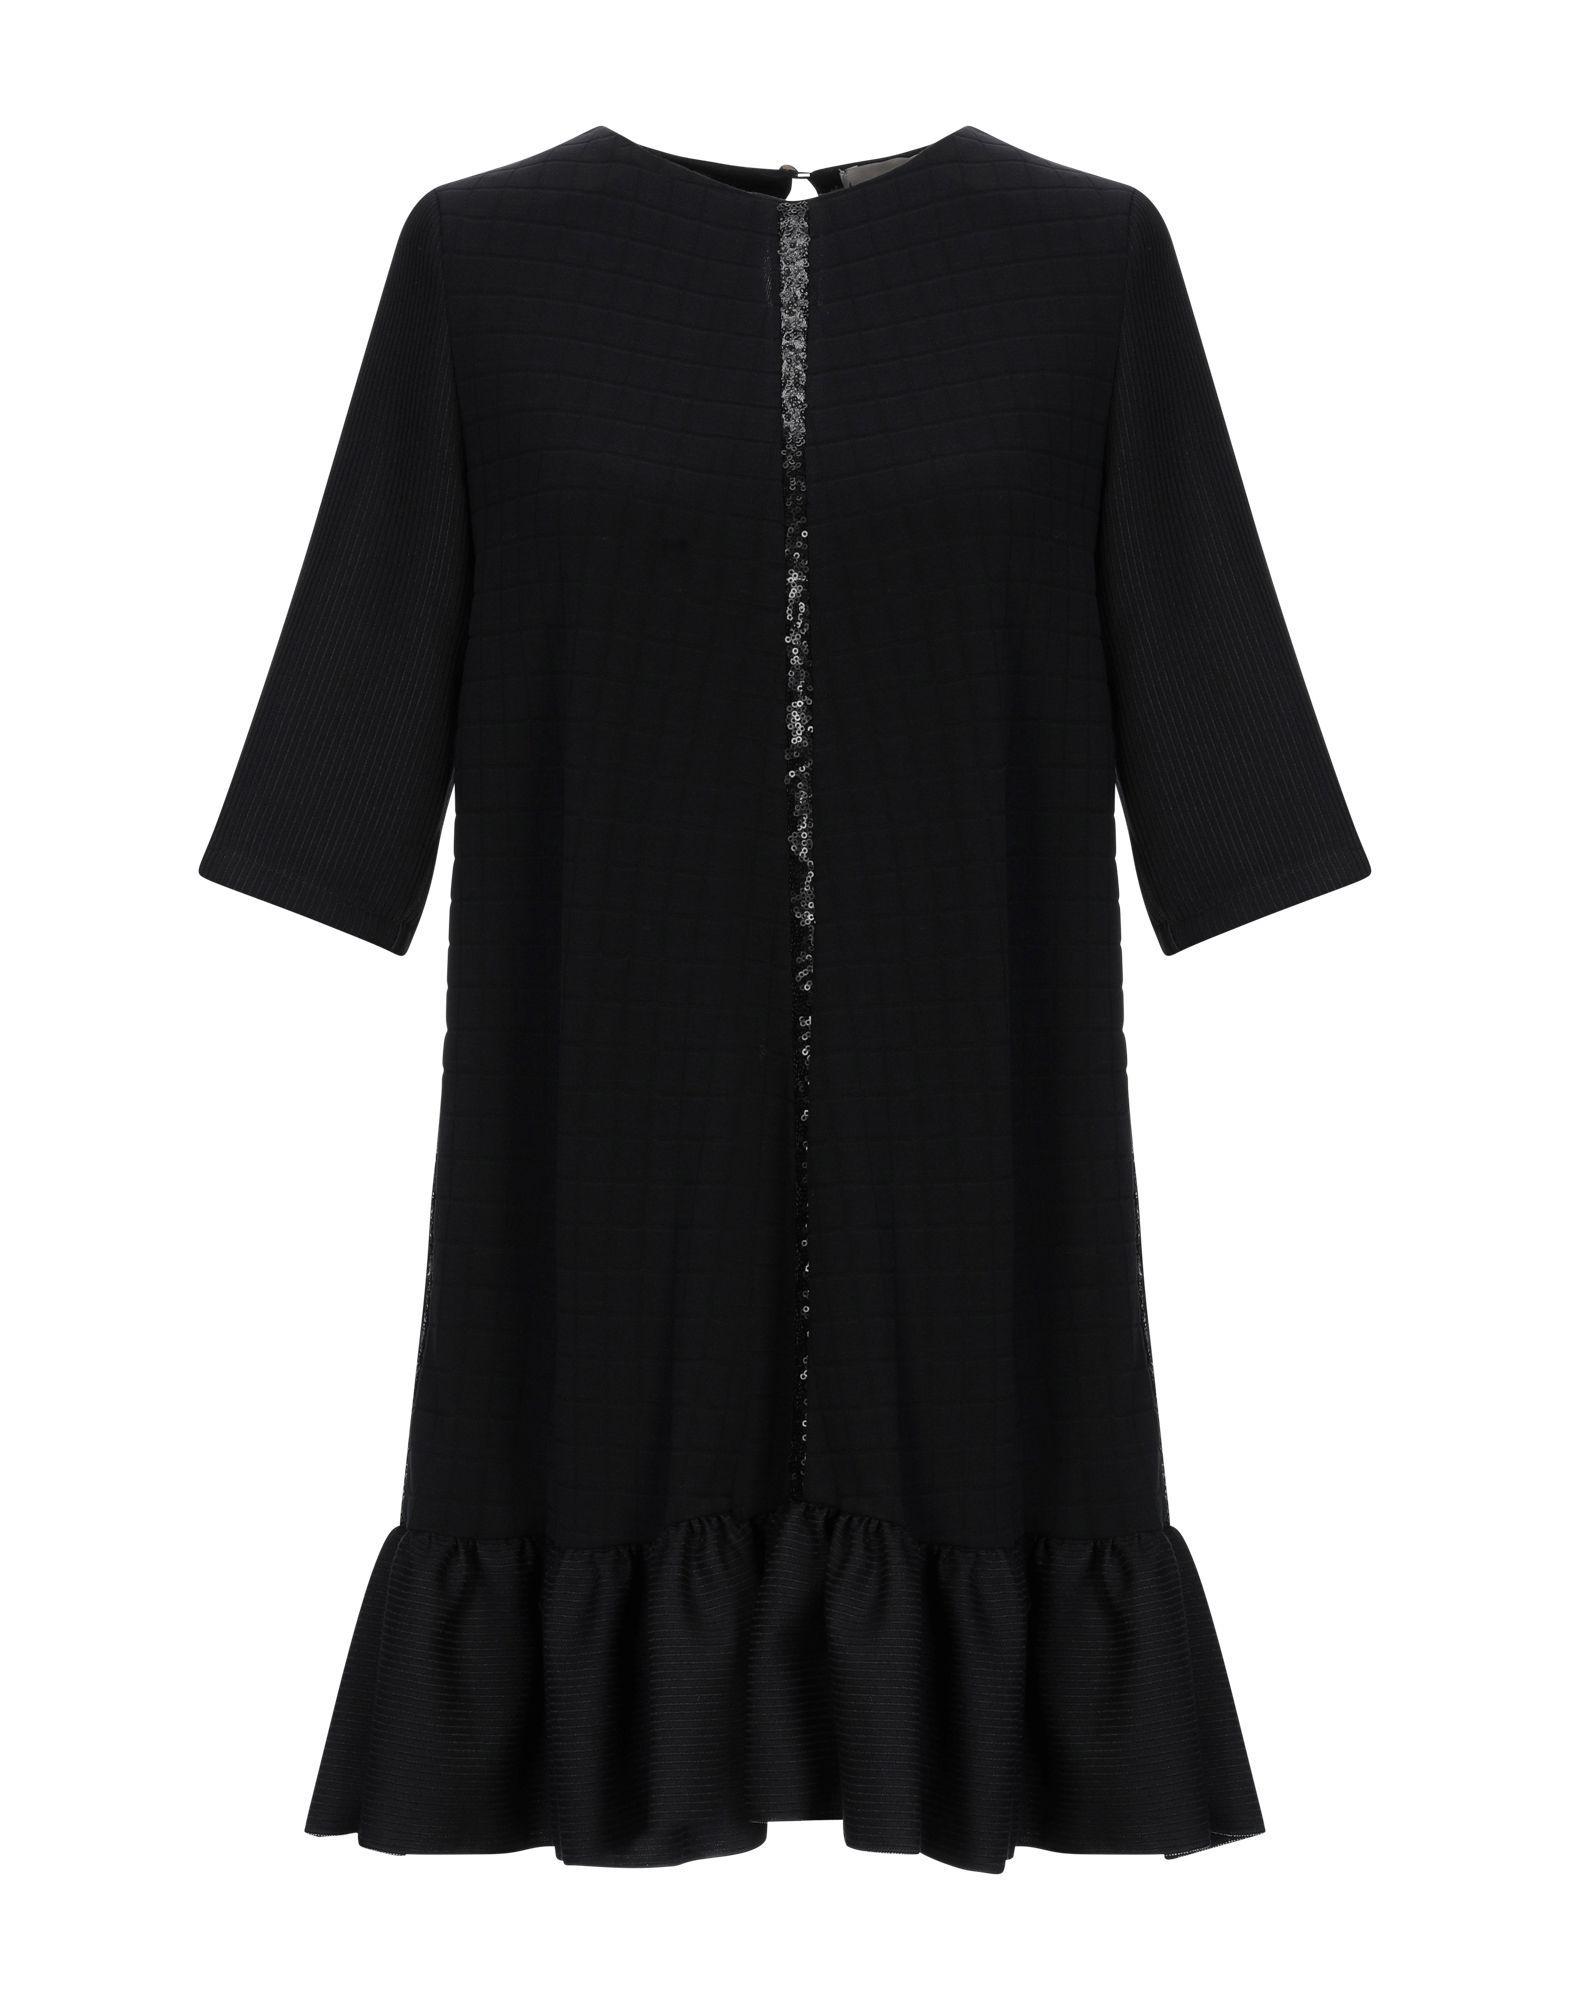 Pinko Black Wool Short Sleeve Dress